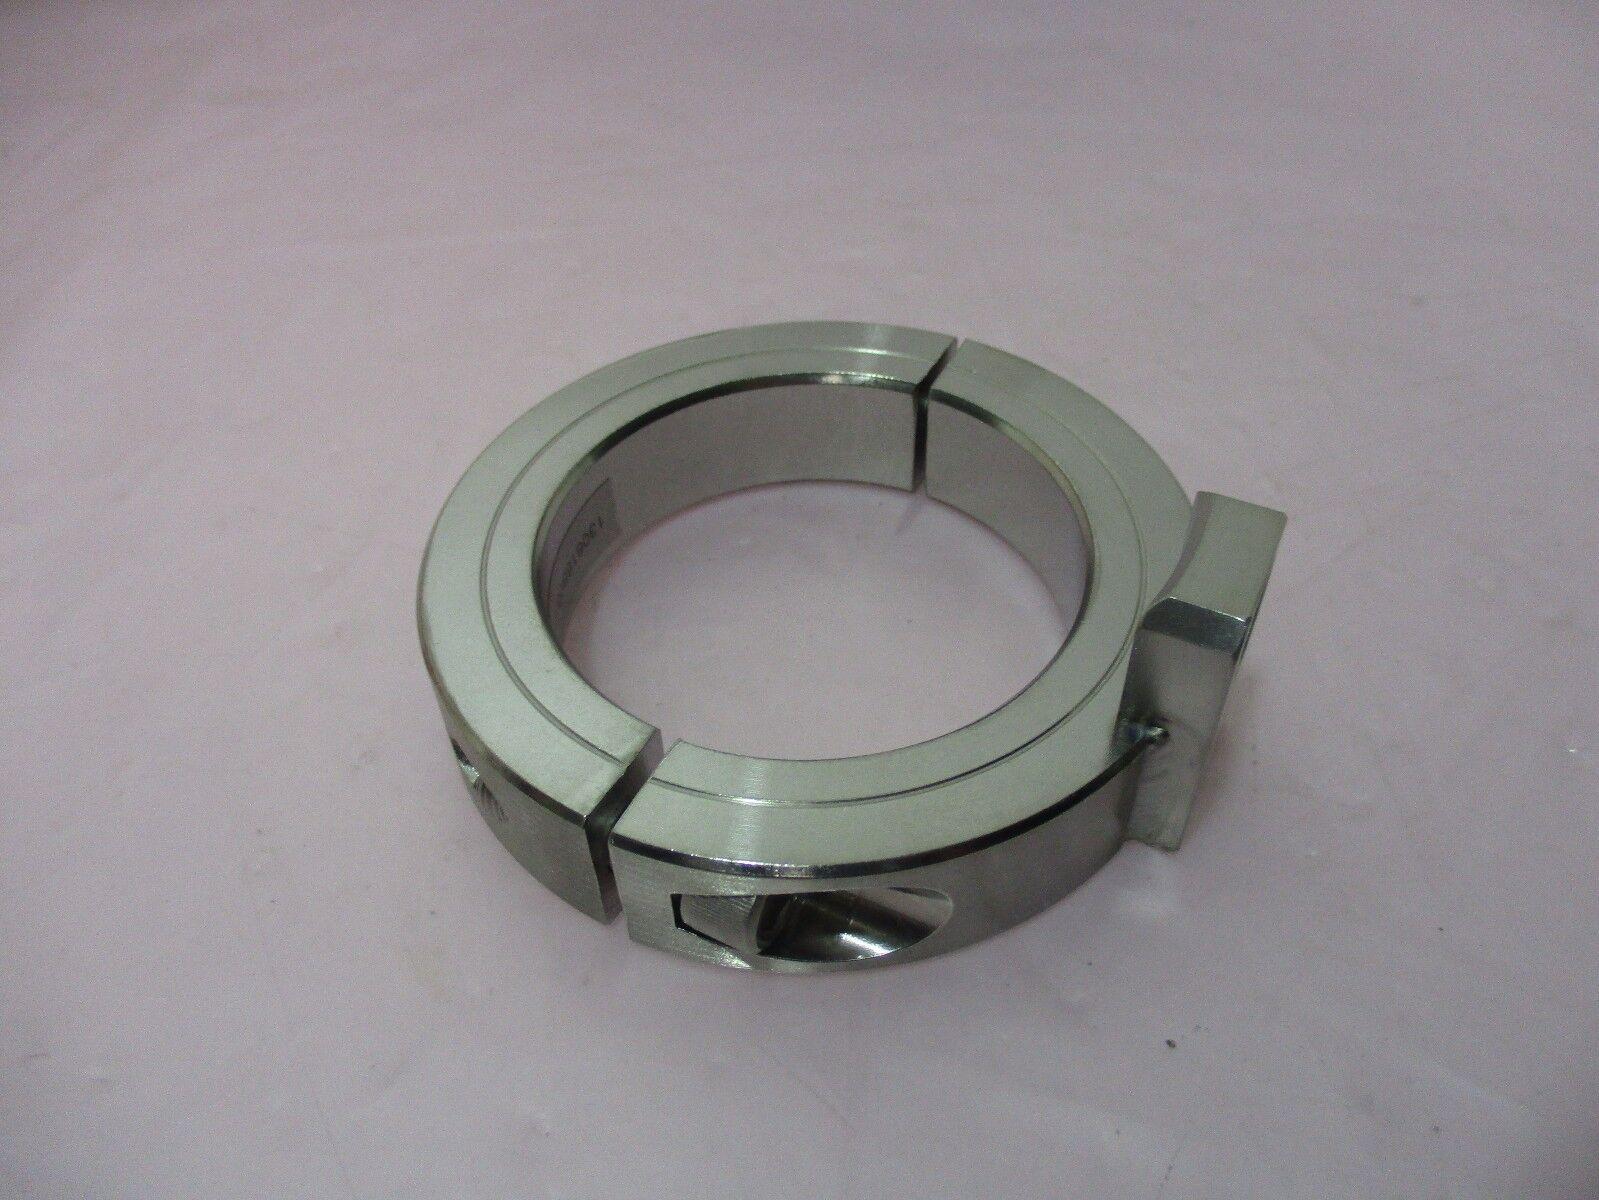 2 LAM 130616800 Rev.003, 125B, Clamping Collar. 417854